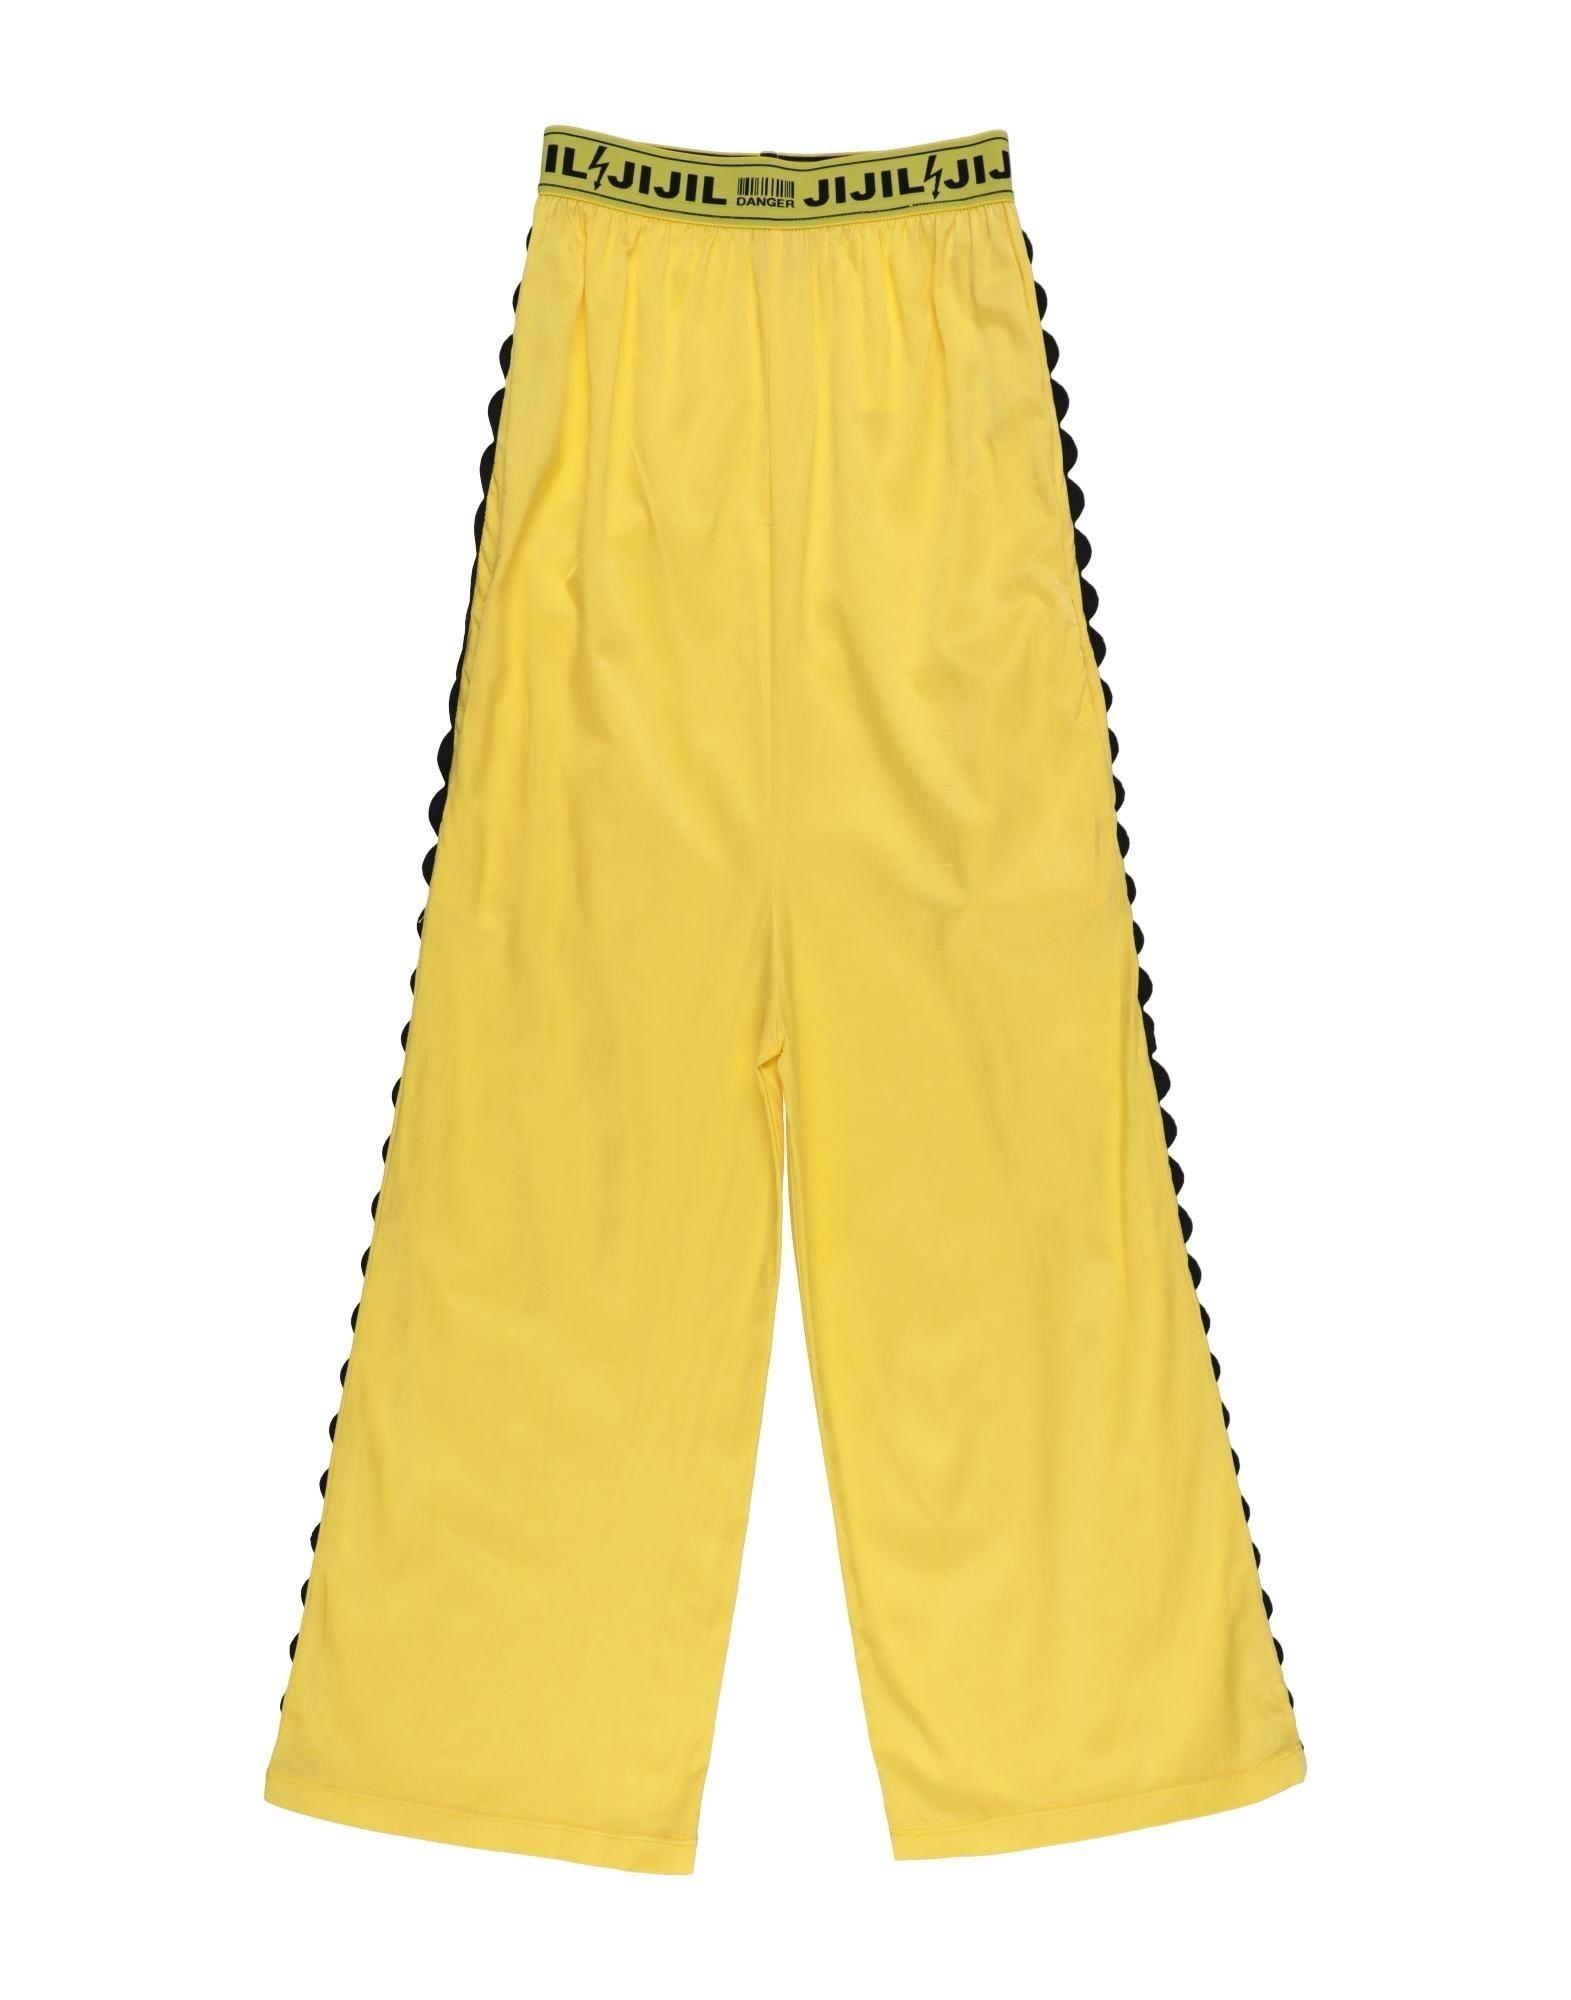 Jijil Jolie Kids' Casual Pants In Yellow